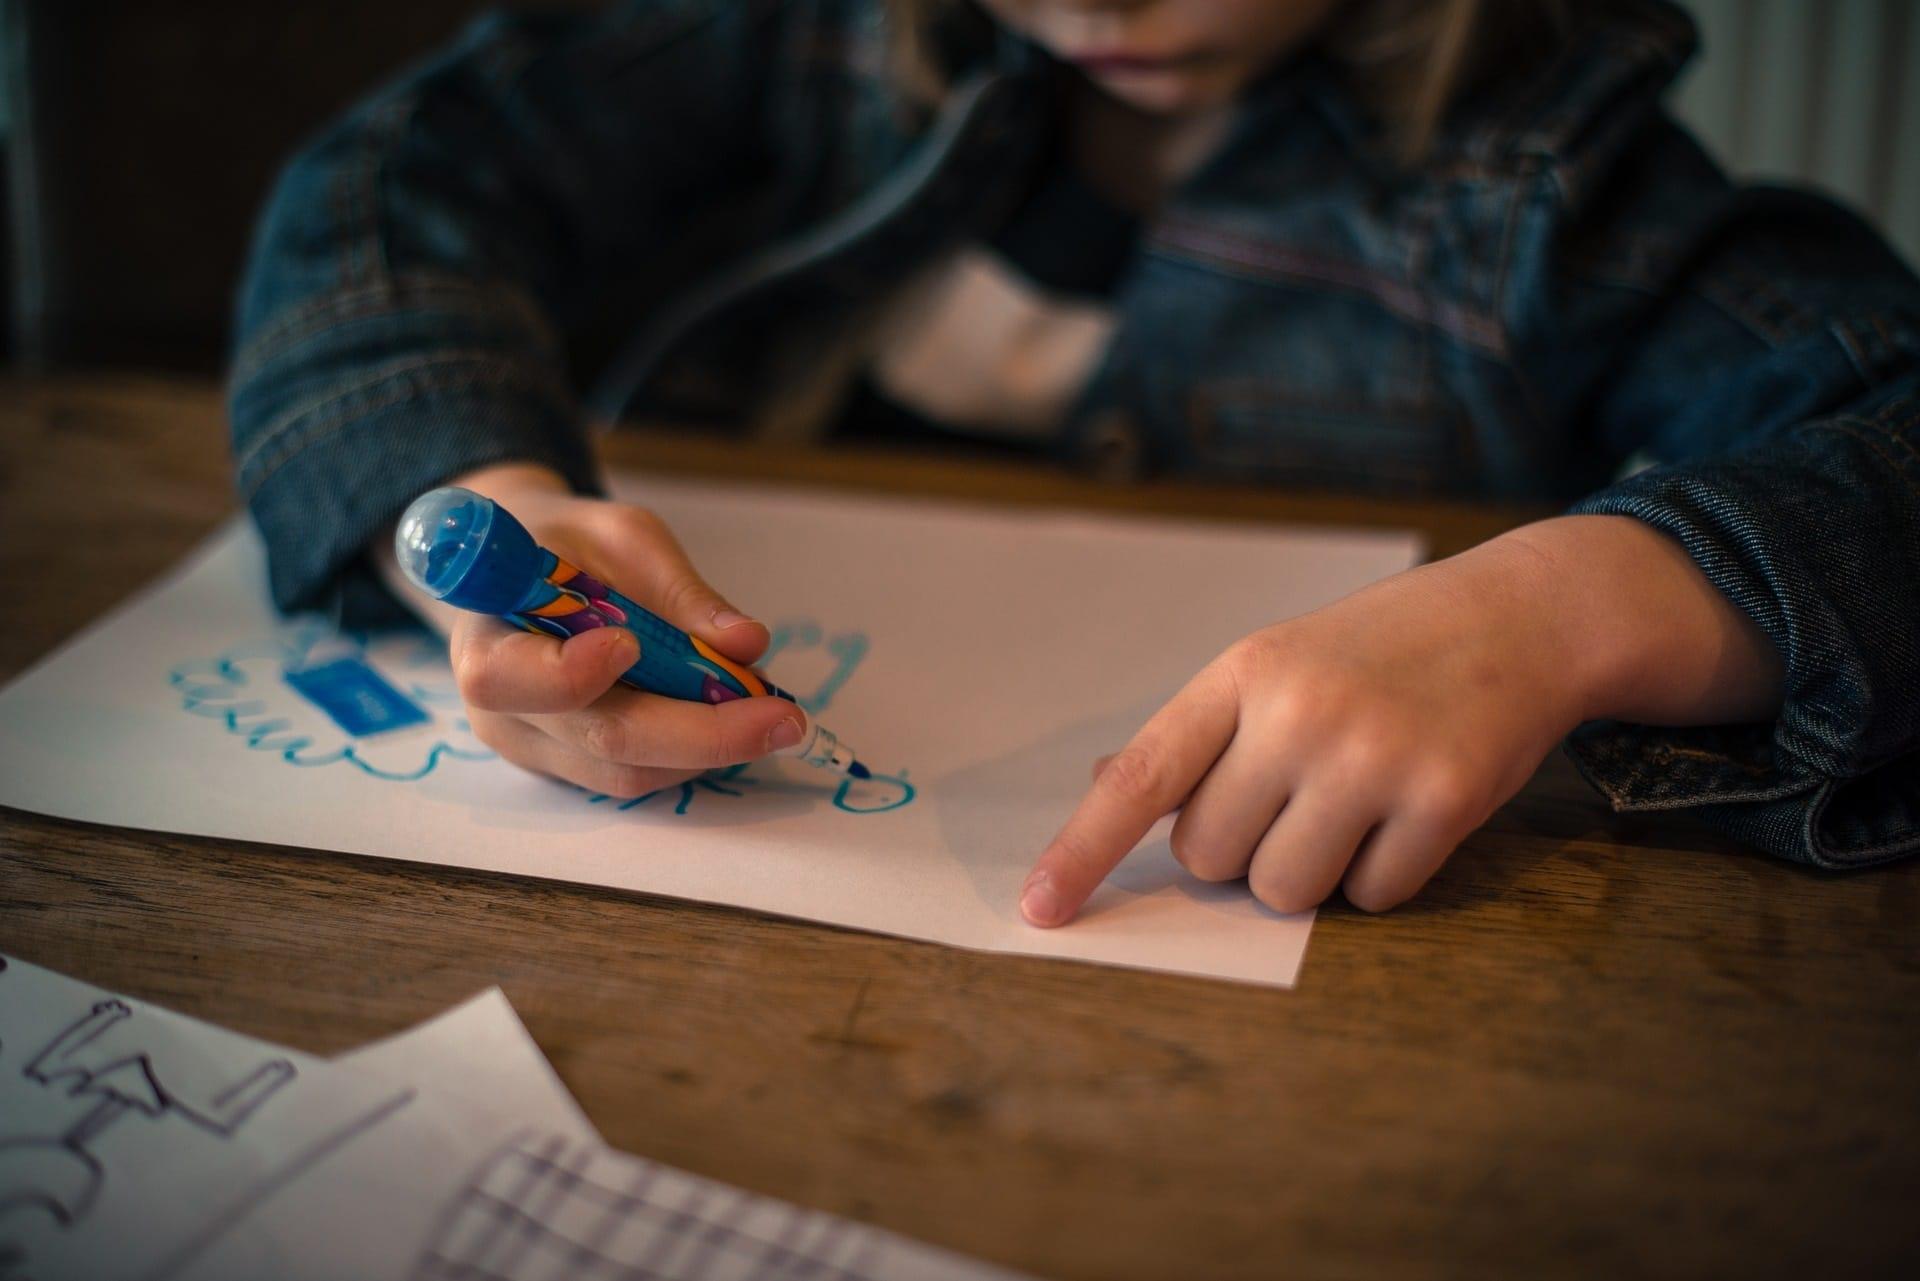 how to raise a smart kid - do art